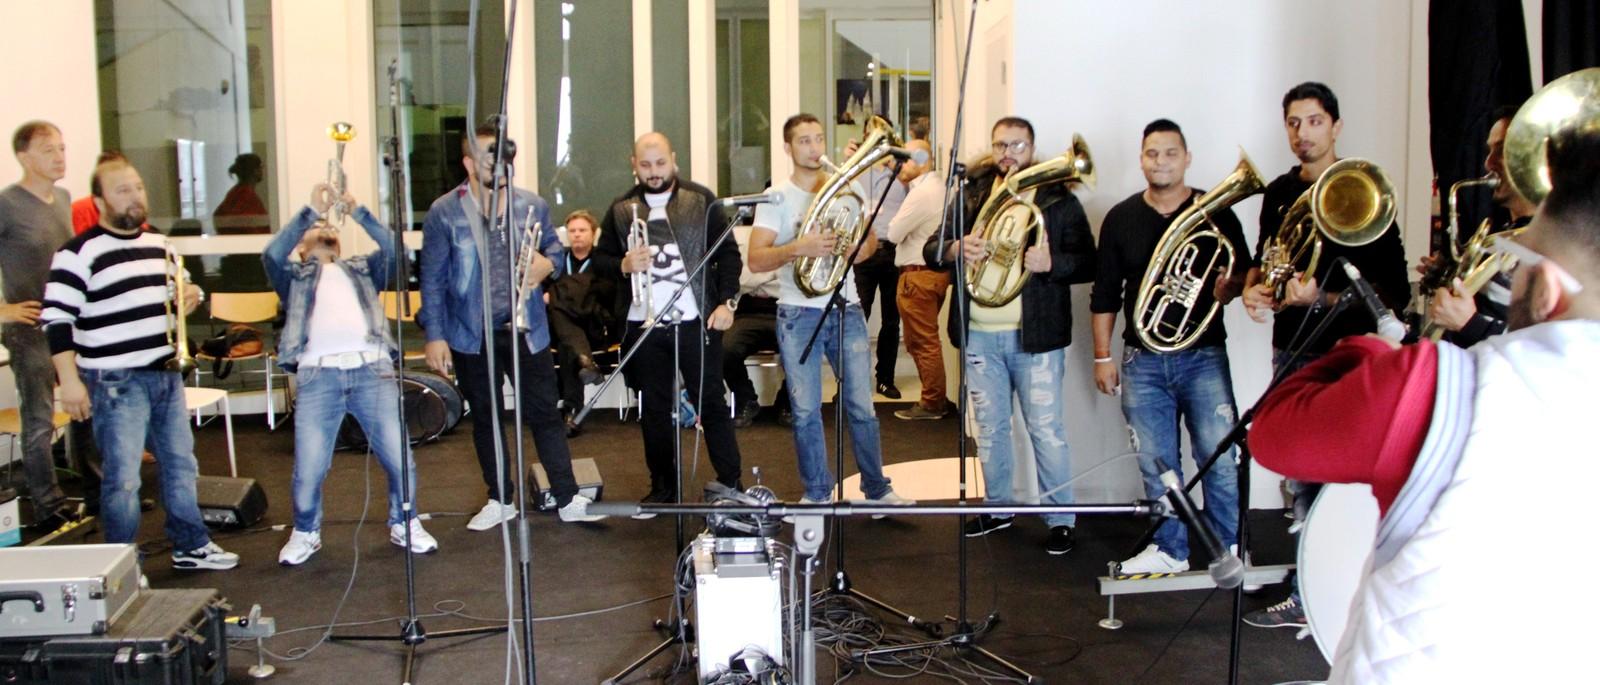 Dzambo Agusev Orchestra på Womex 2014, direkte på Jungeltelegrafen.